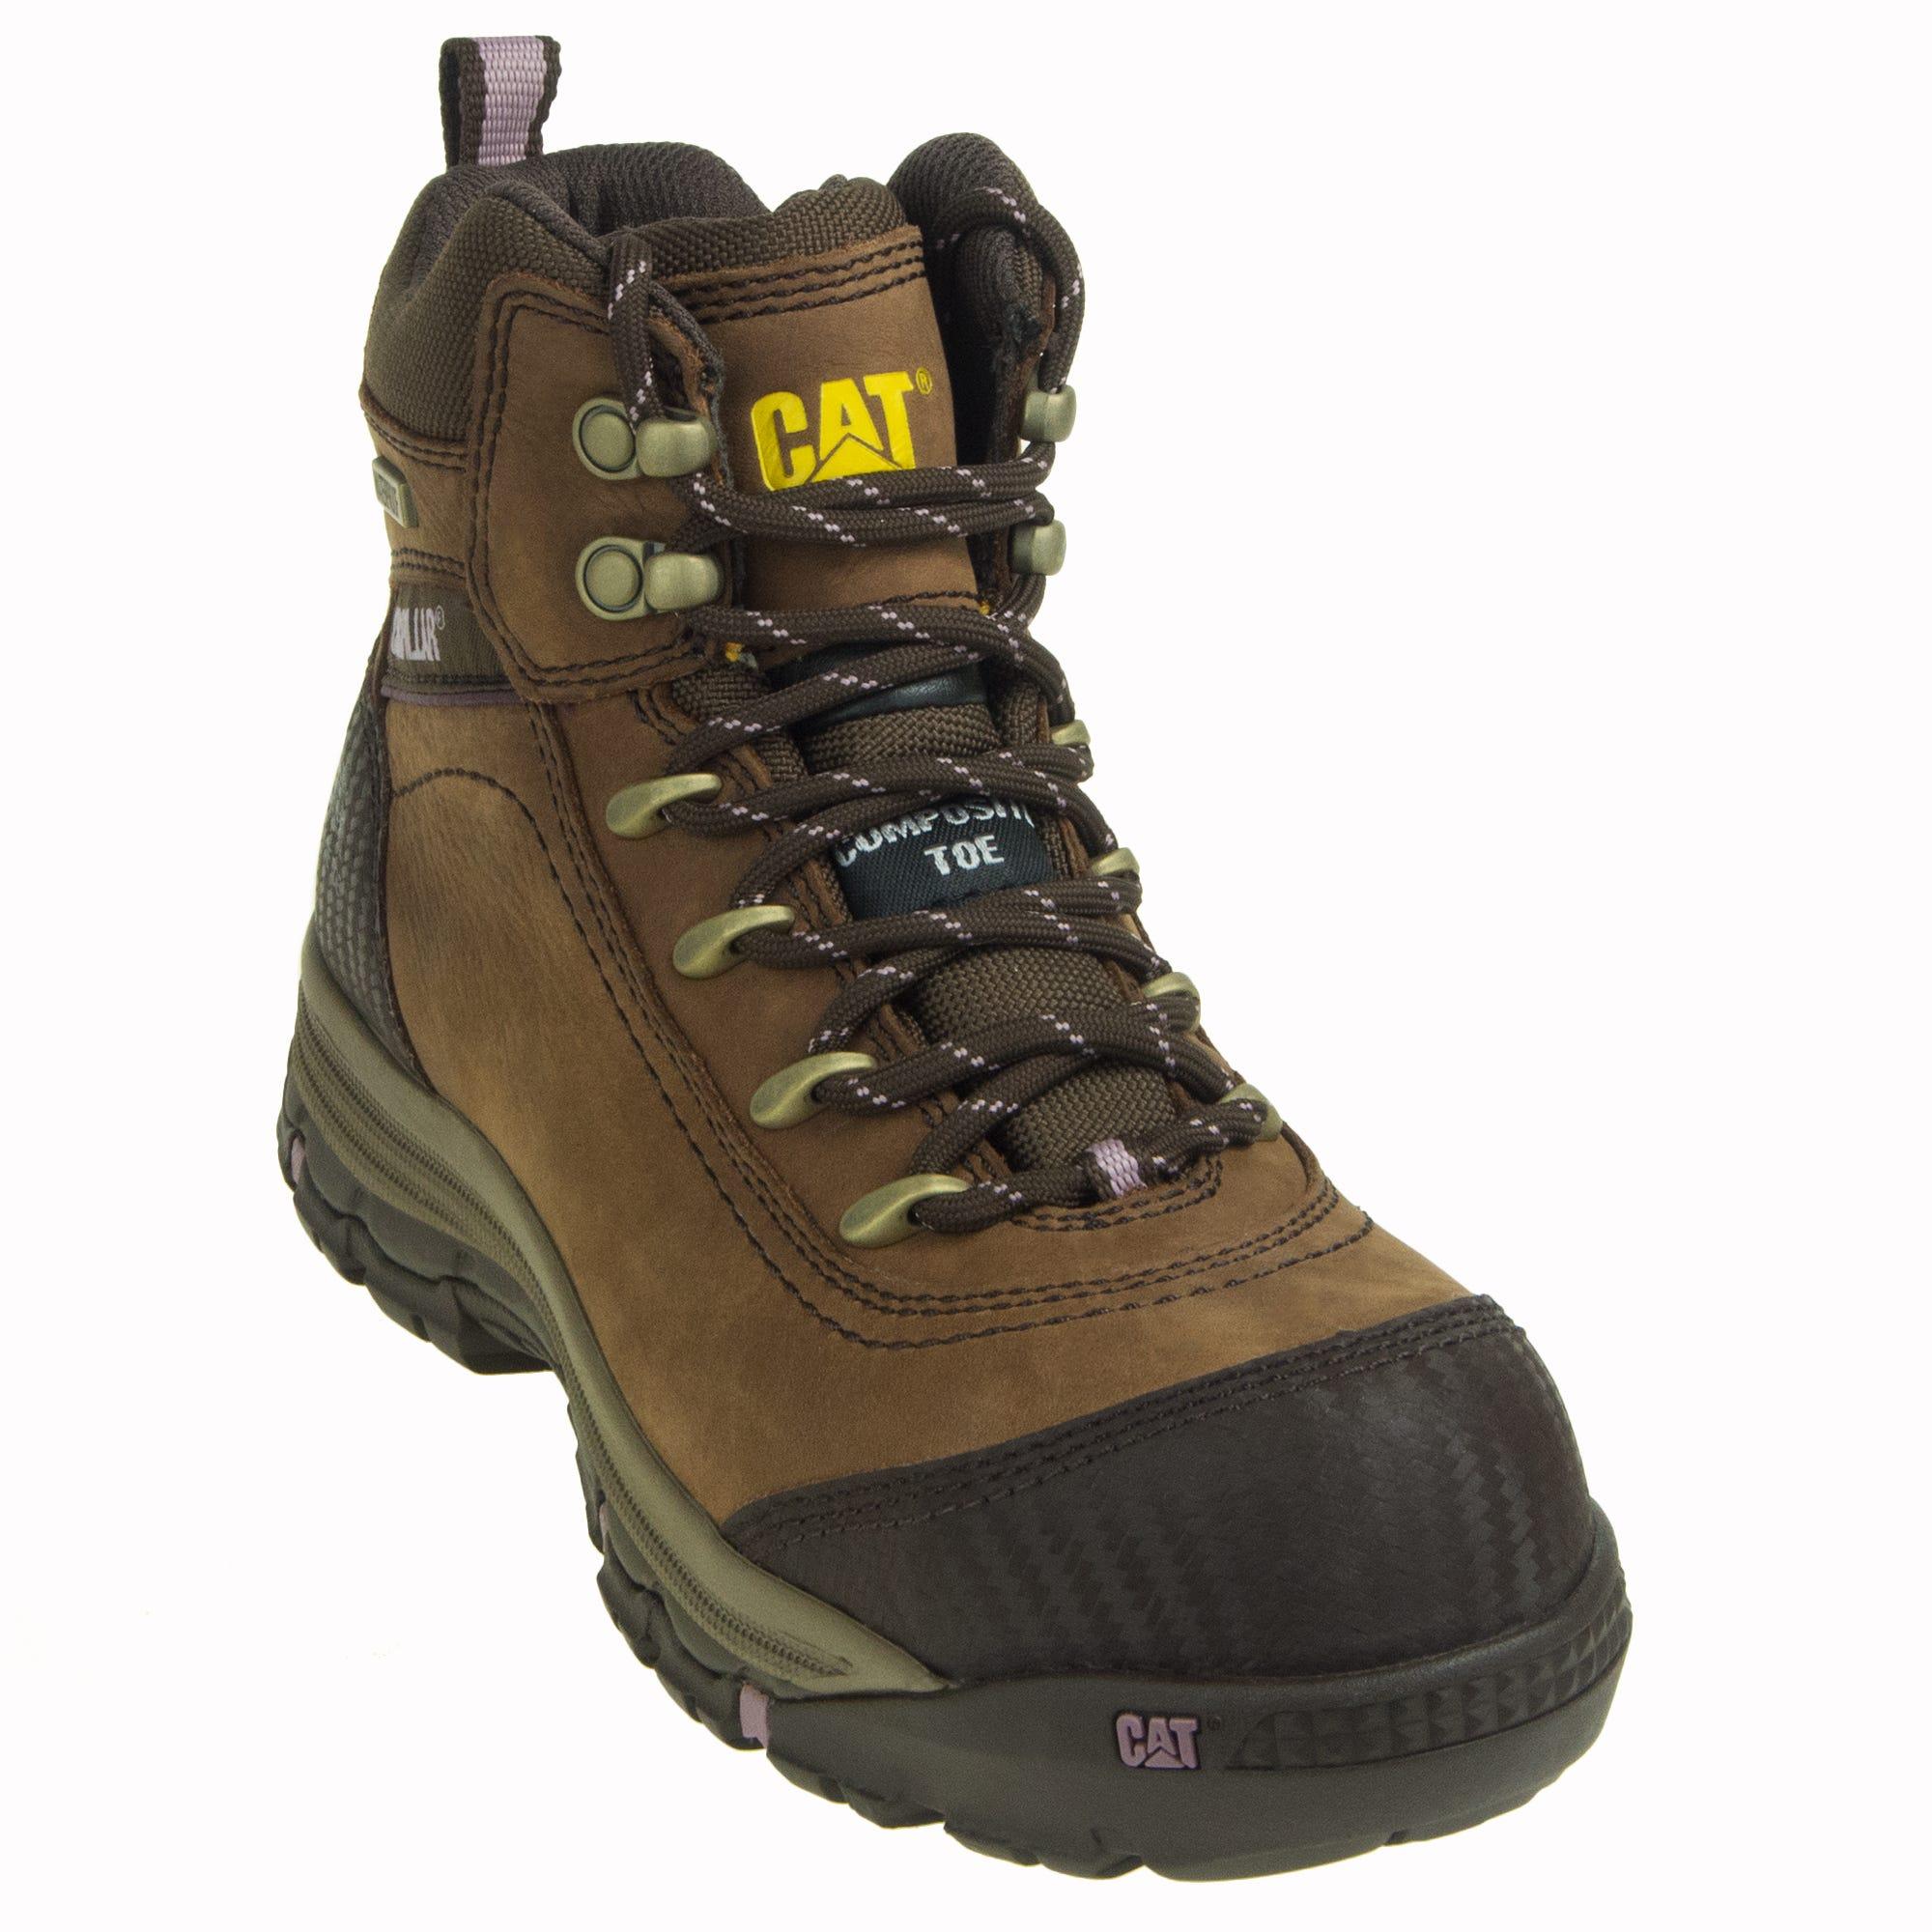 Caterpillar Women's Ally 90760 Brown Composite Toe Work Boots